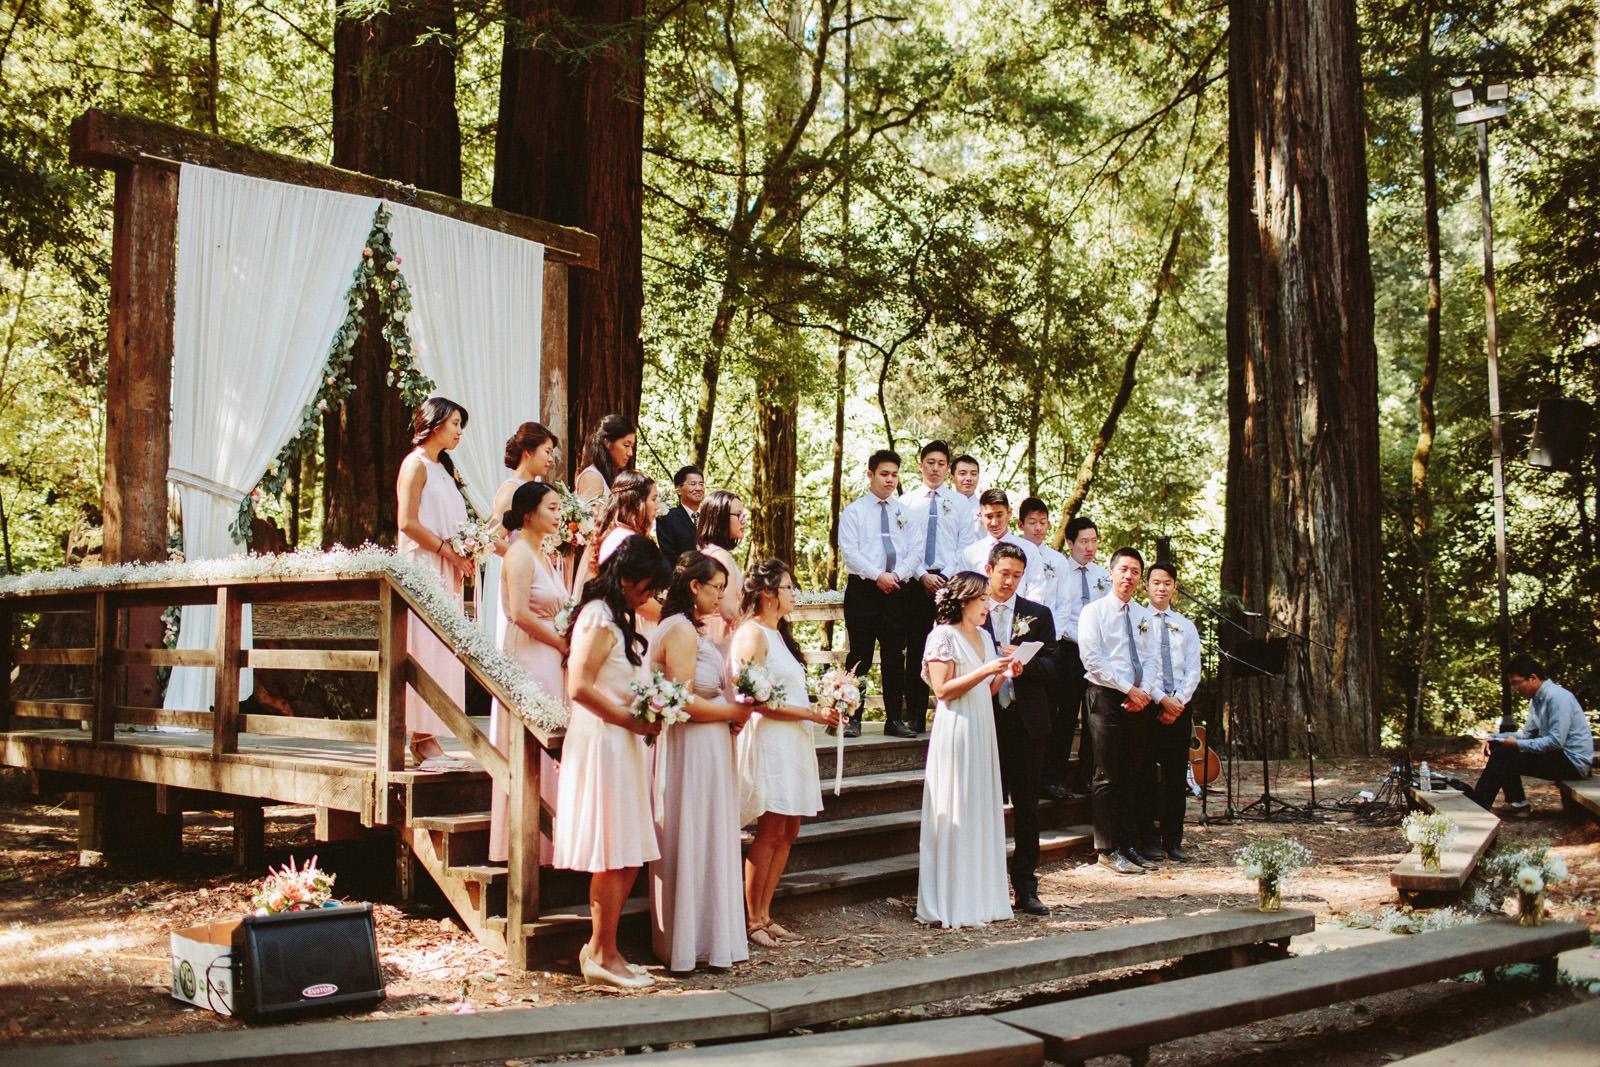 kimclay-blog-026 REDWOOD FOREST WEDDING